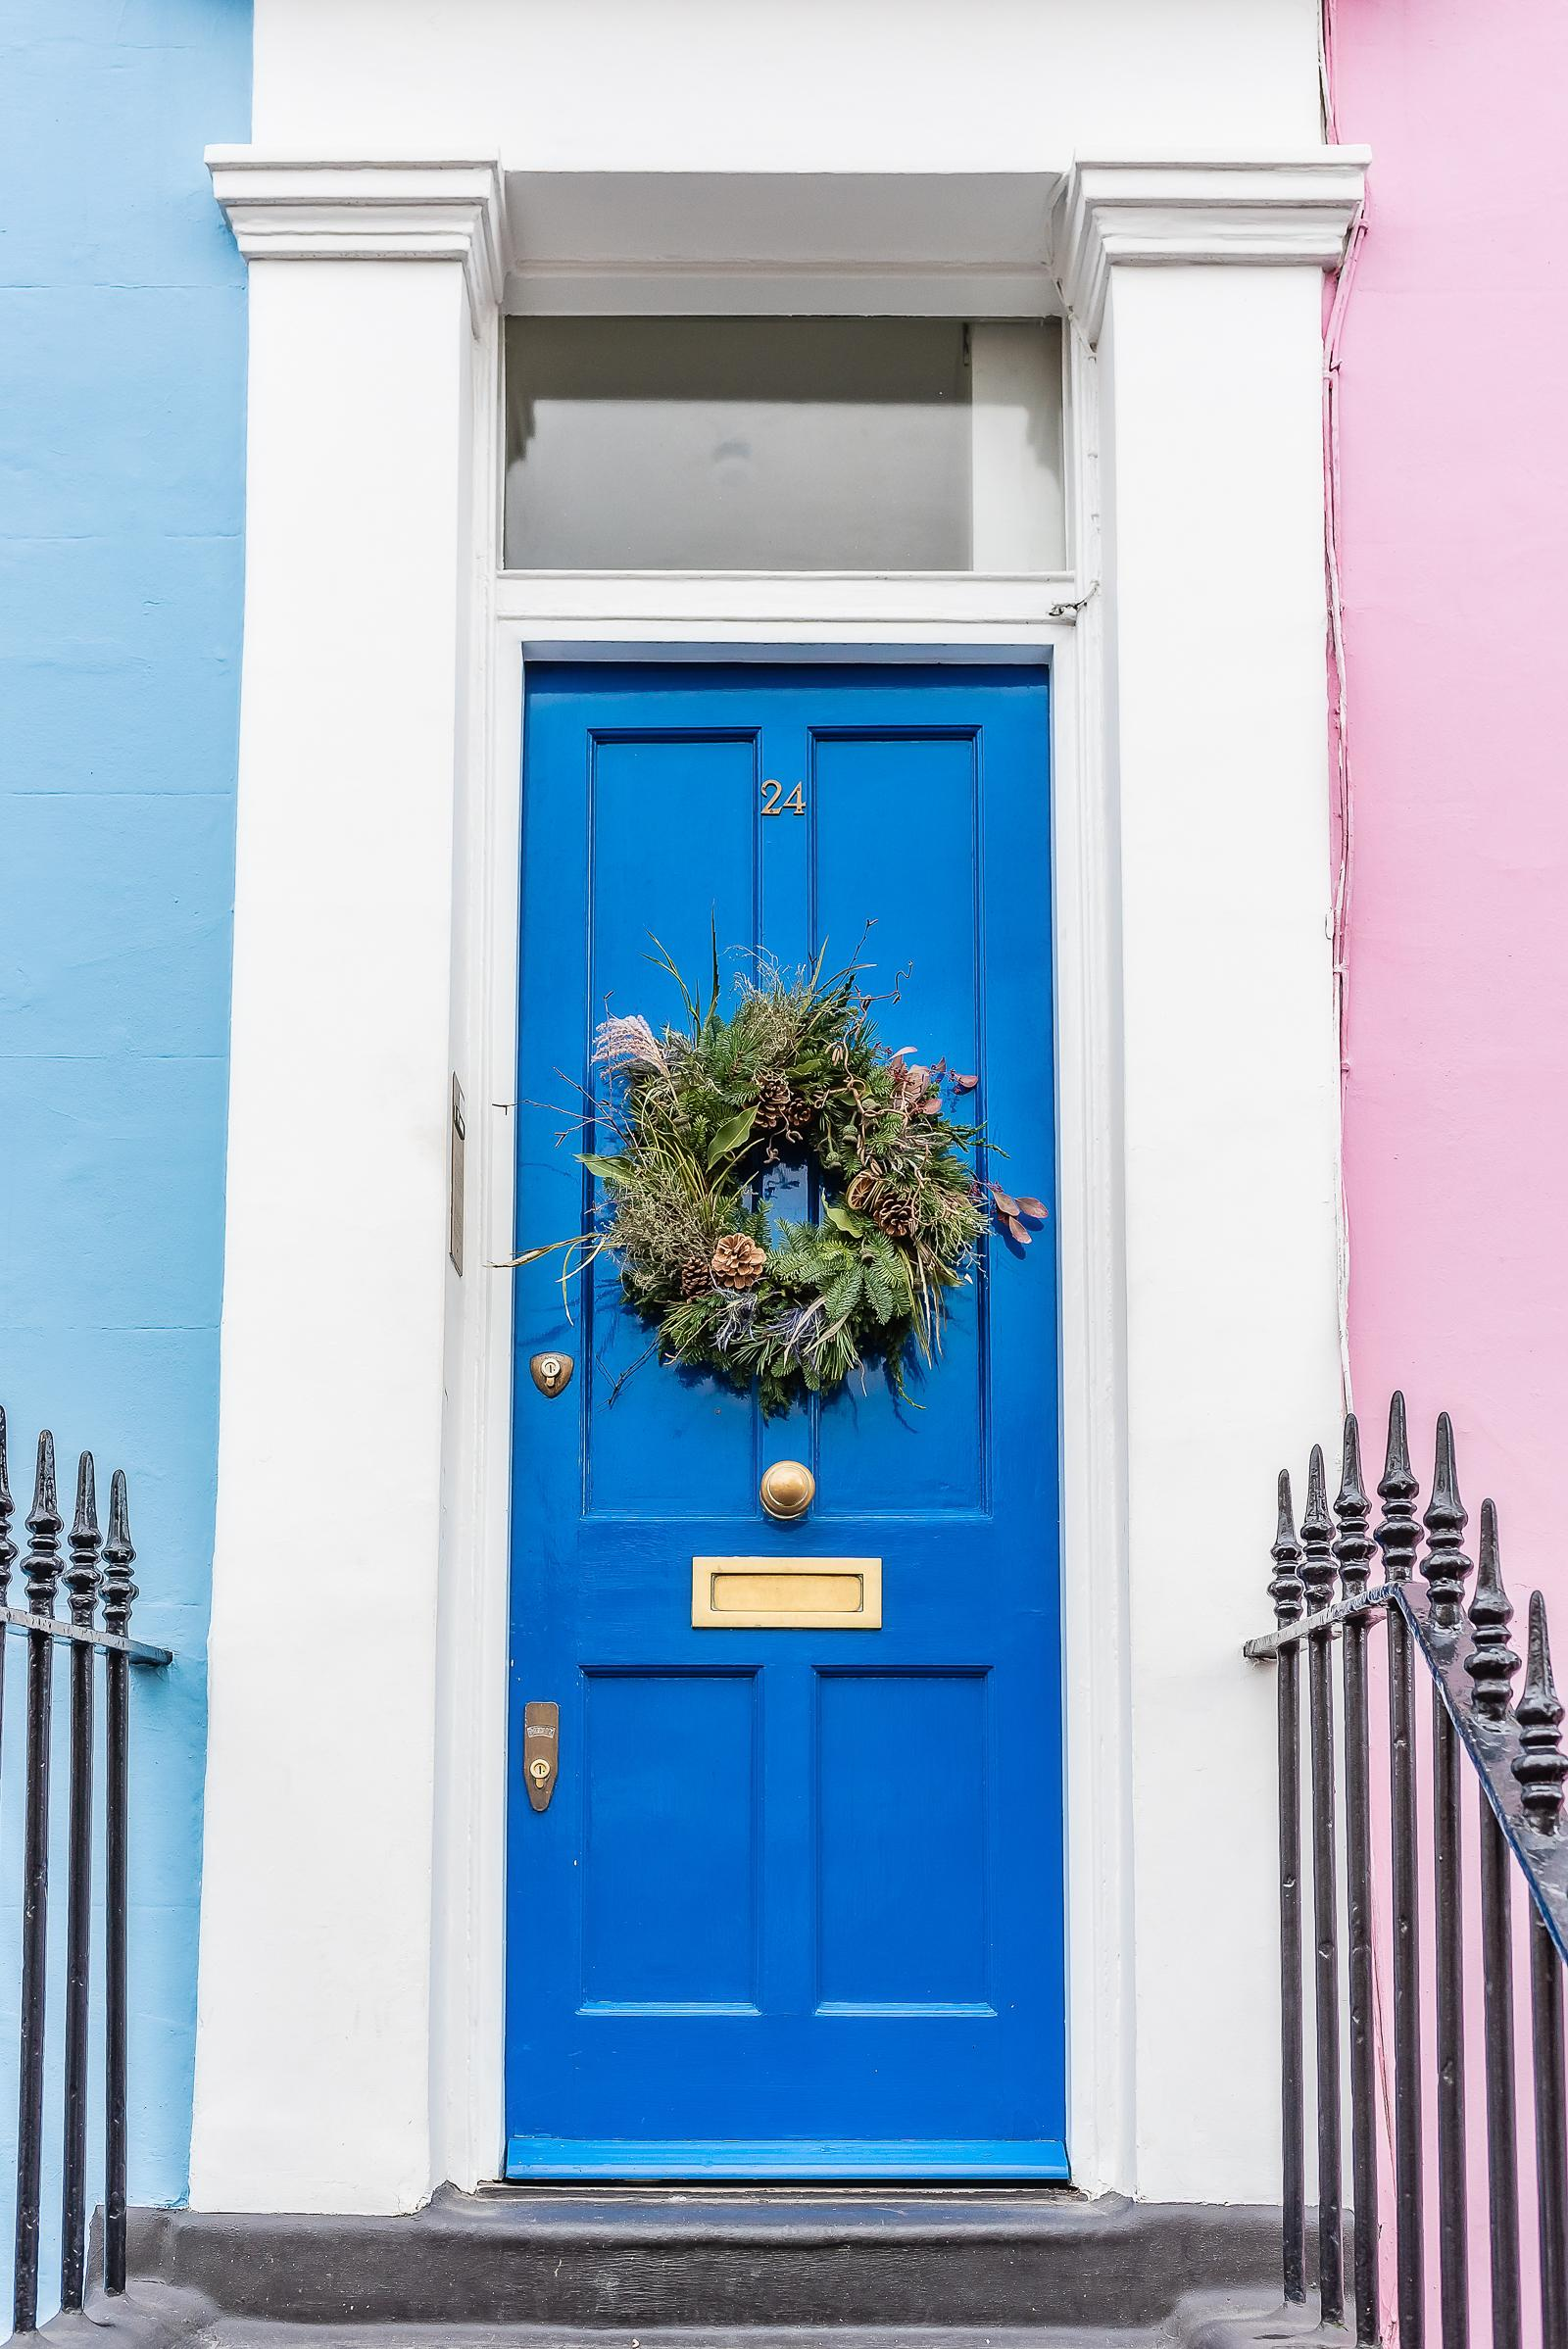 Notting Hill London December 2018